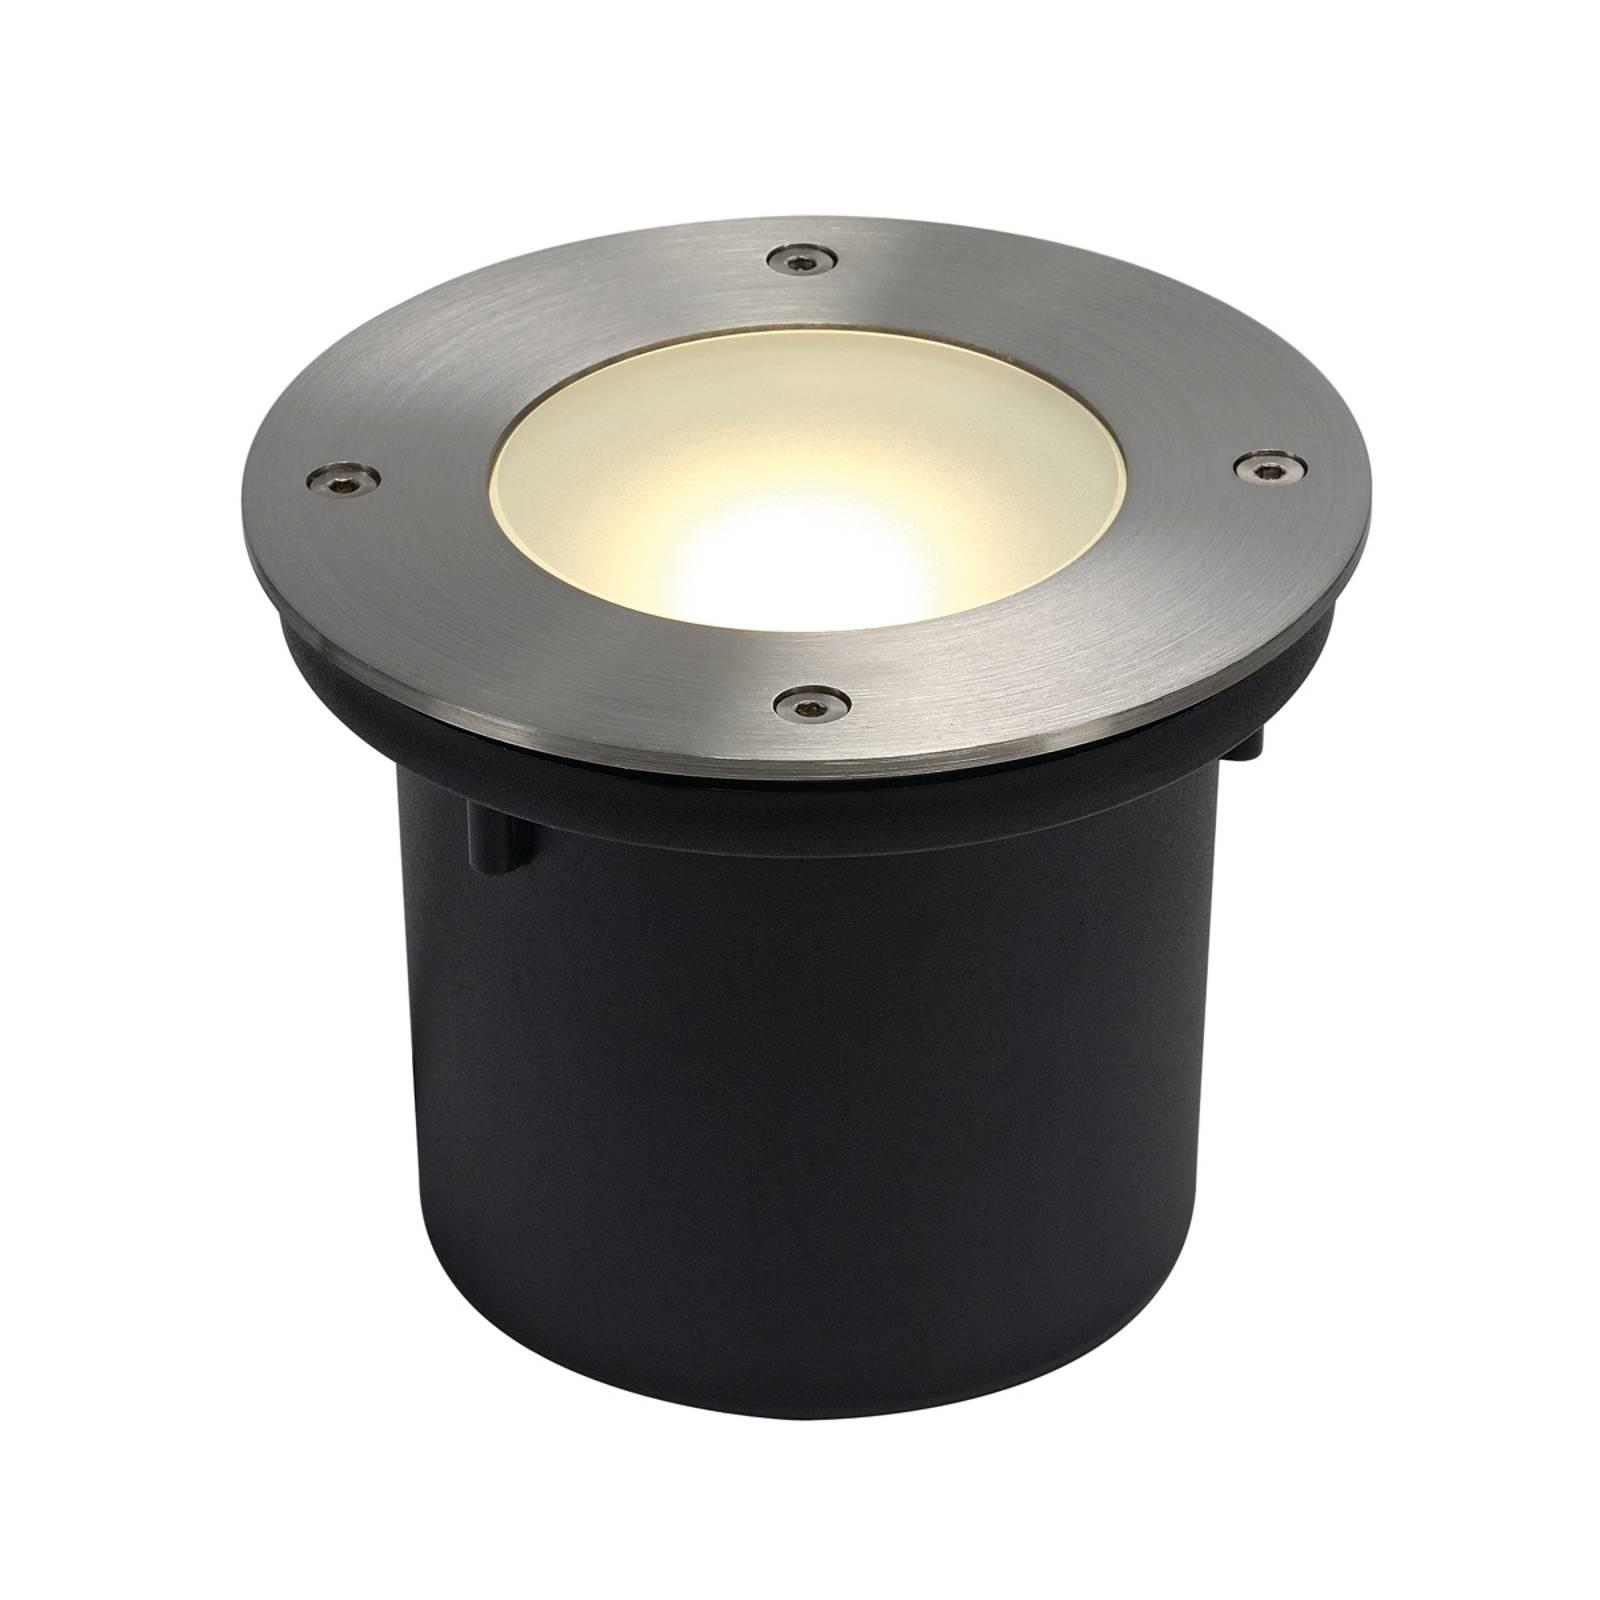 SLV Wetsy Disk LED-maavalaisin, pyöreä